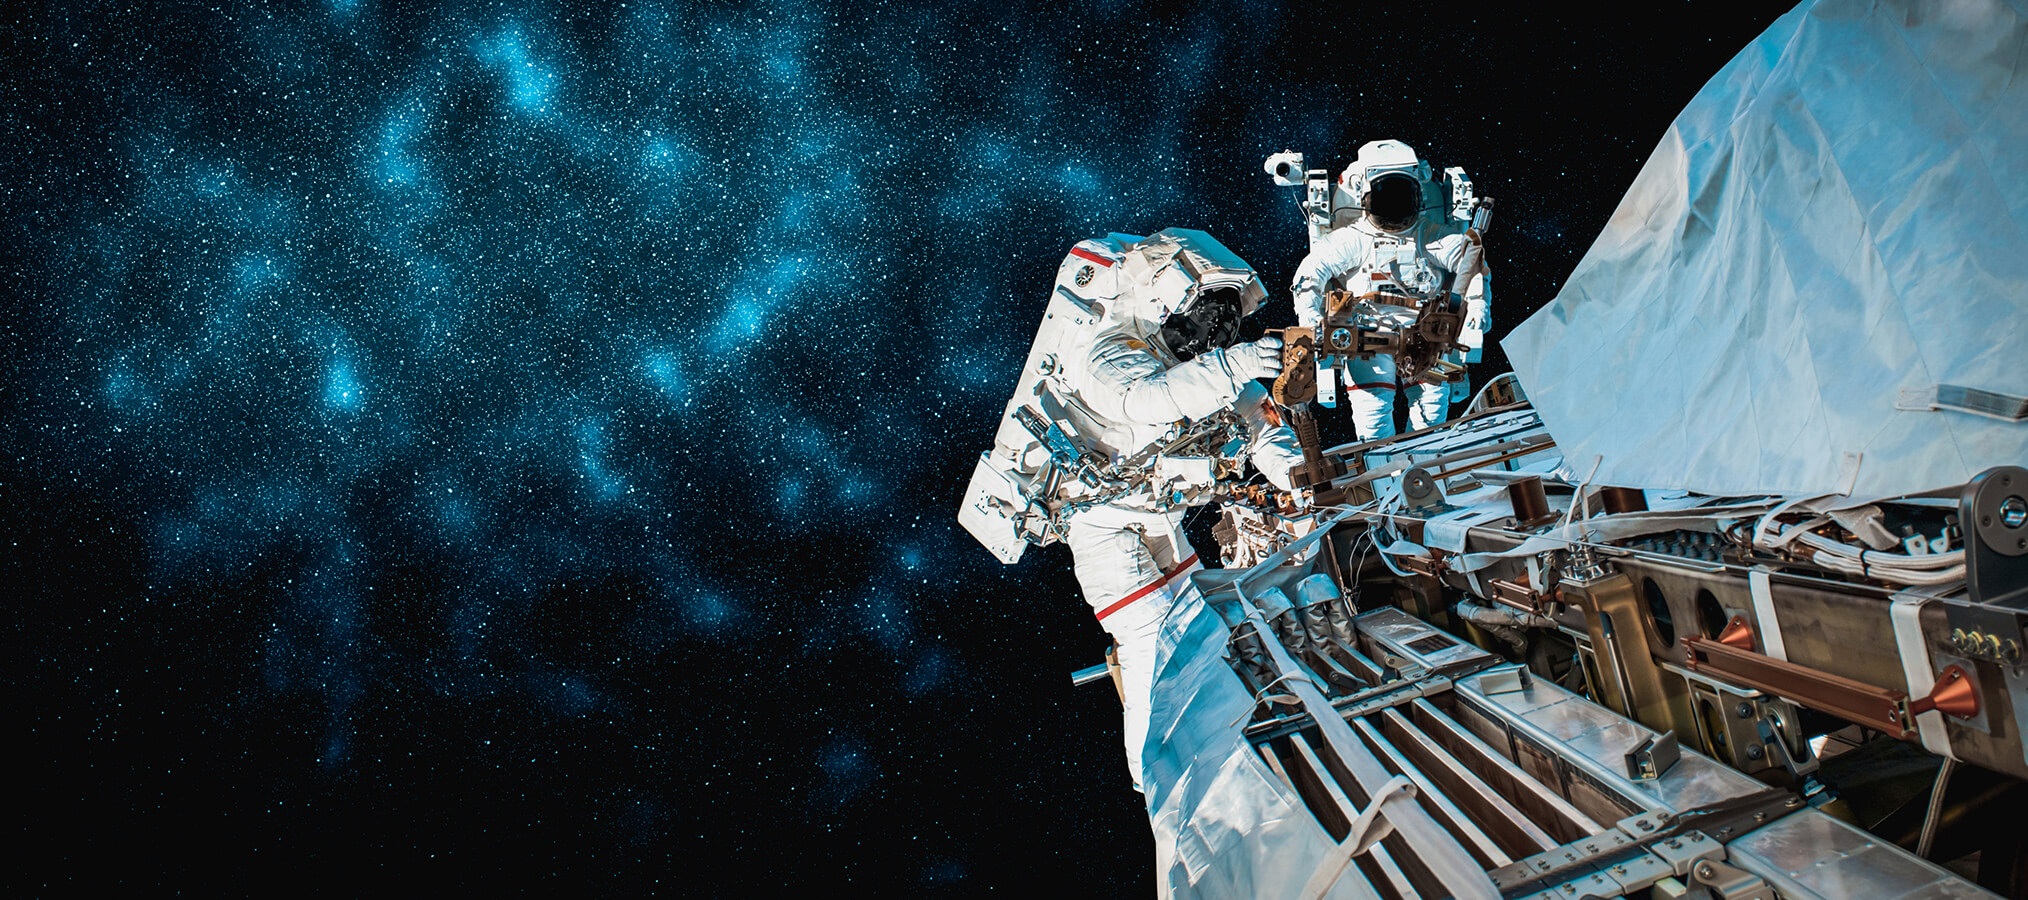 astronaut-working-space-station (1).jpg